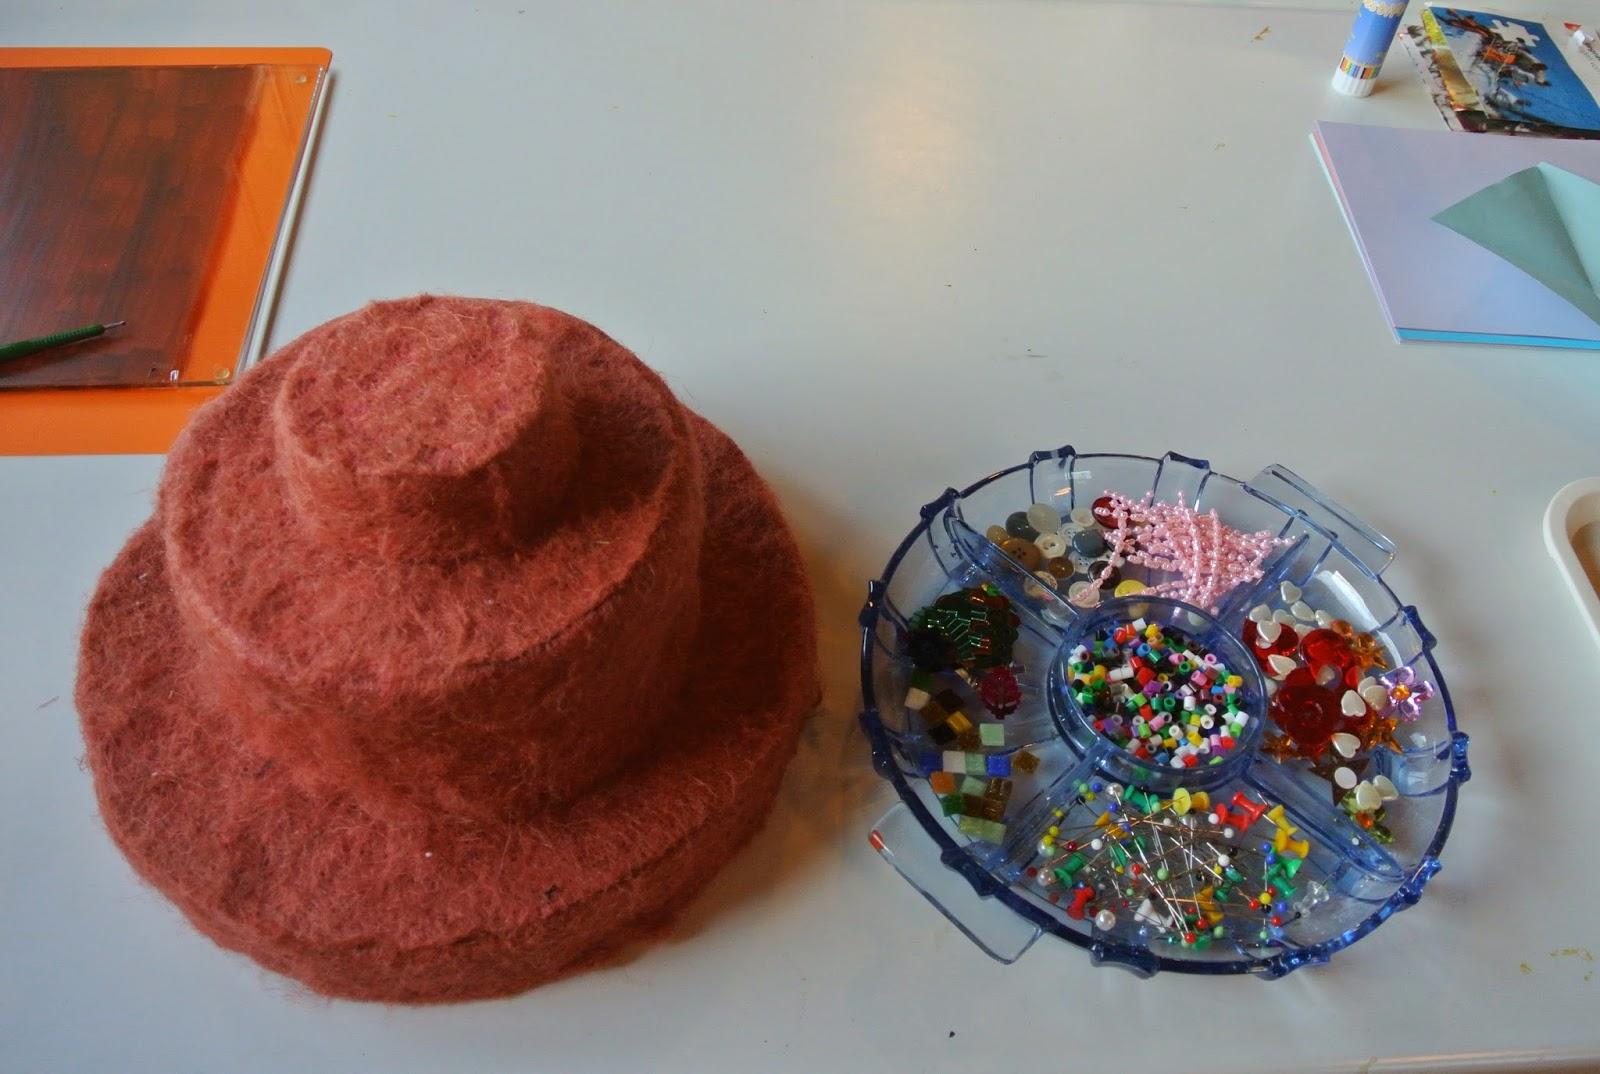 Artis kreativ werkstatt - Kuchen dekorieren ...